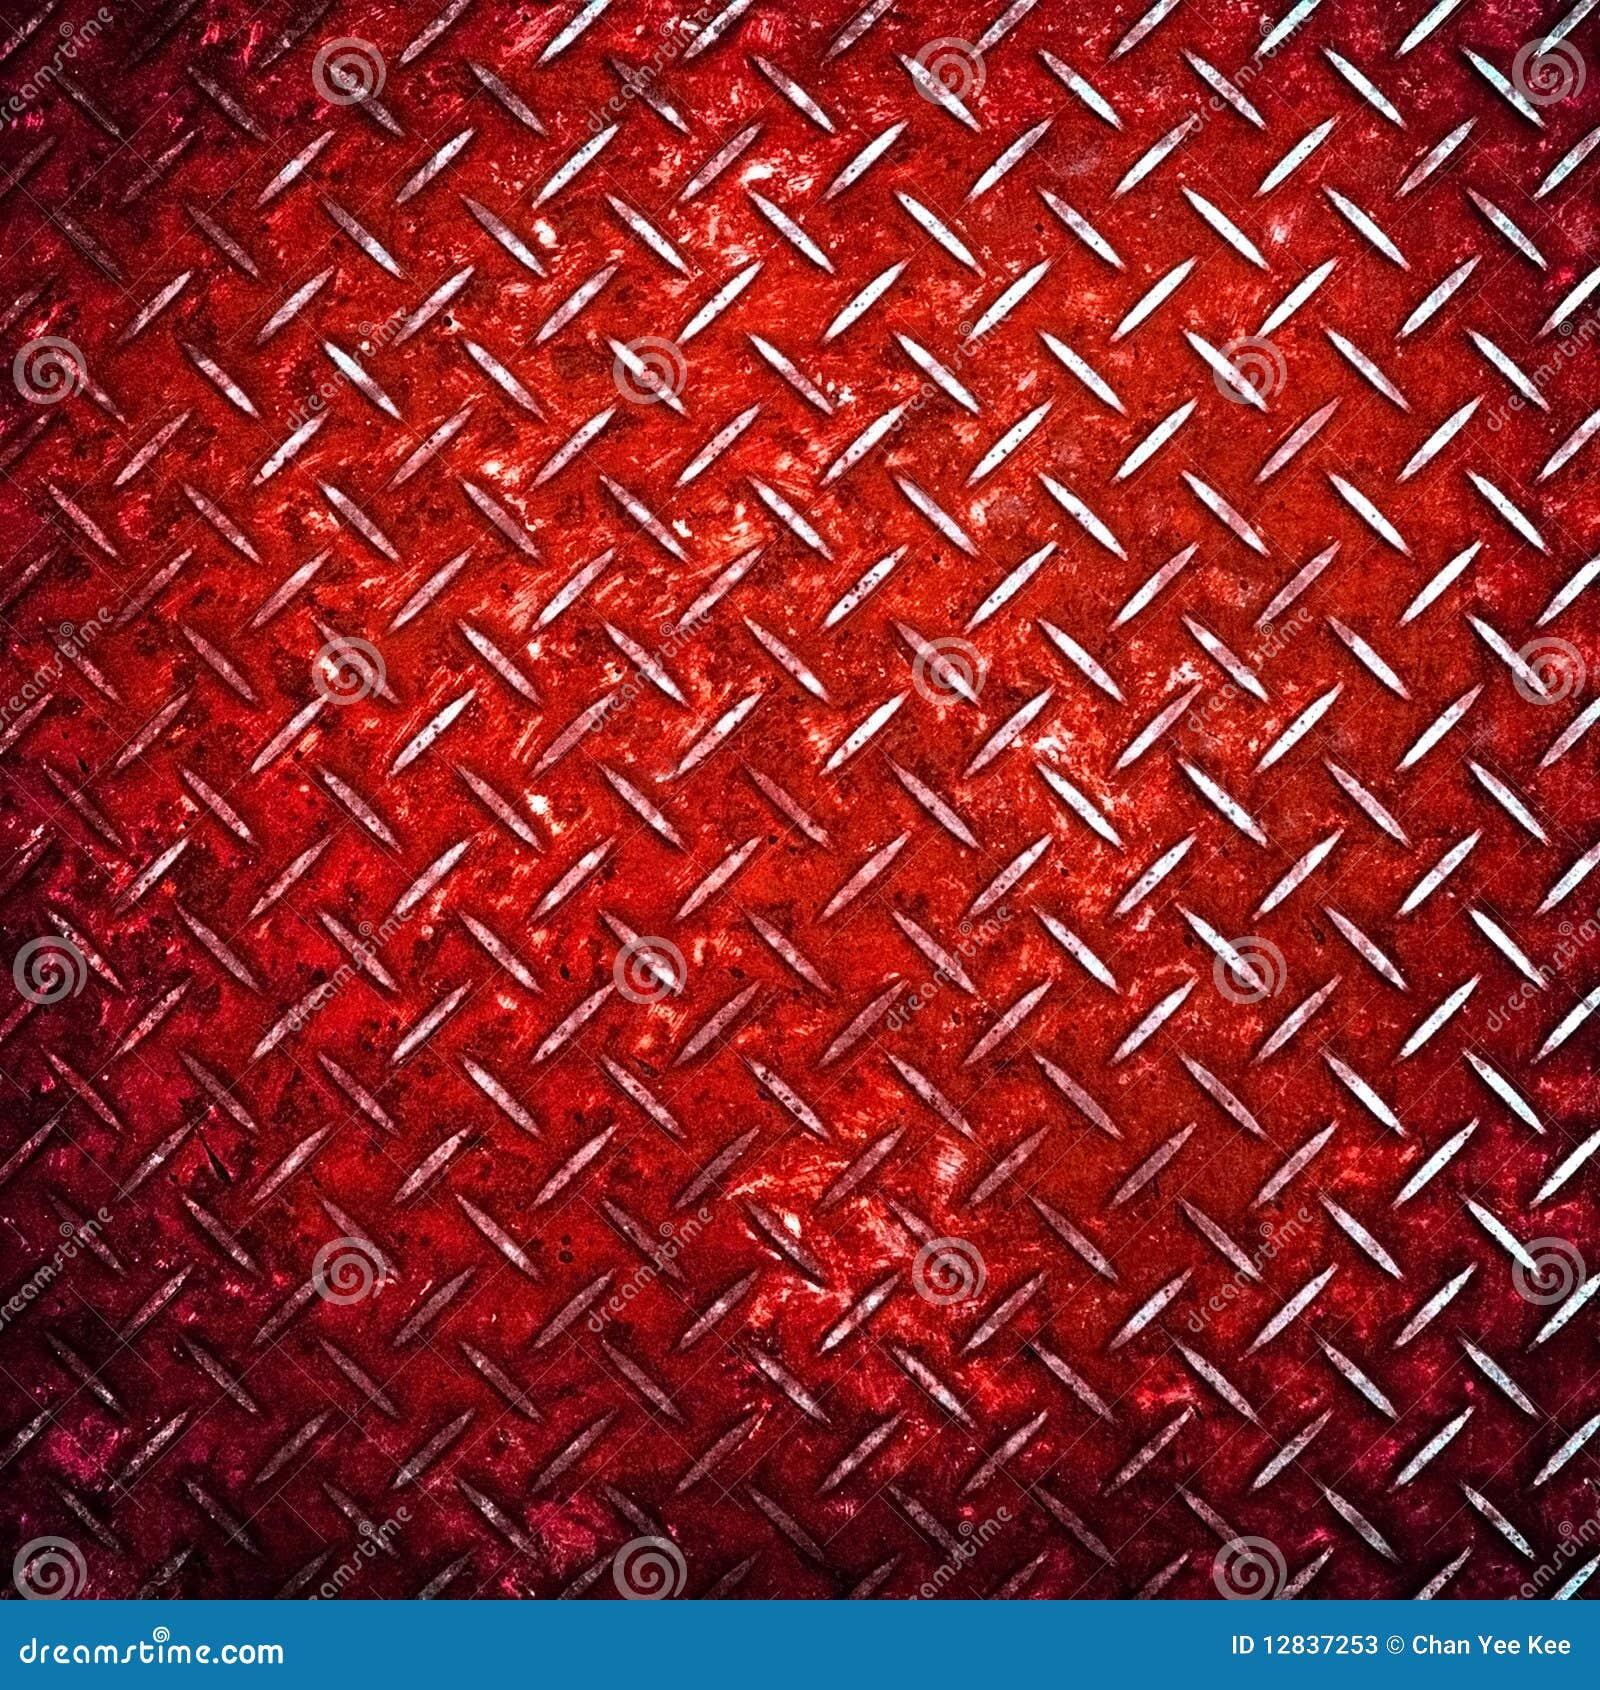 red diamonds background-#37